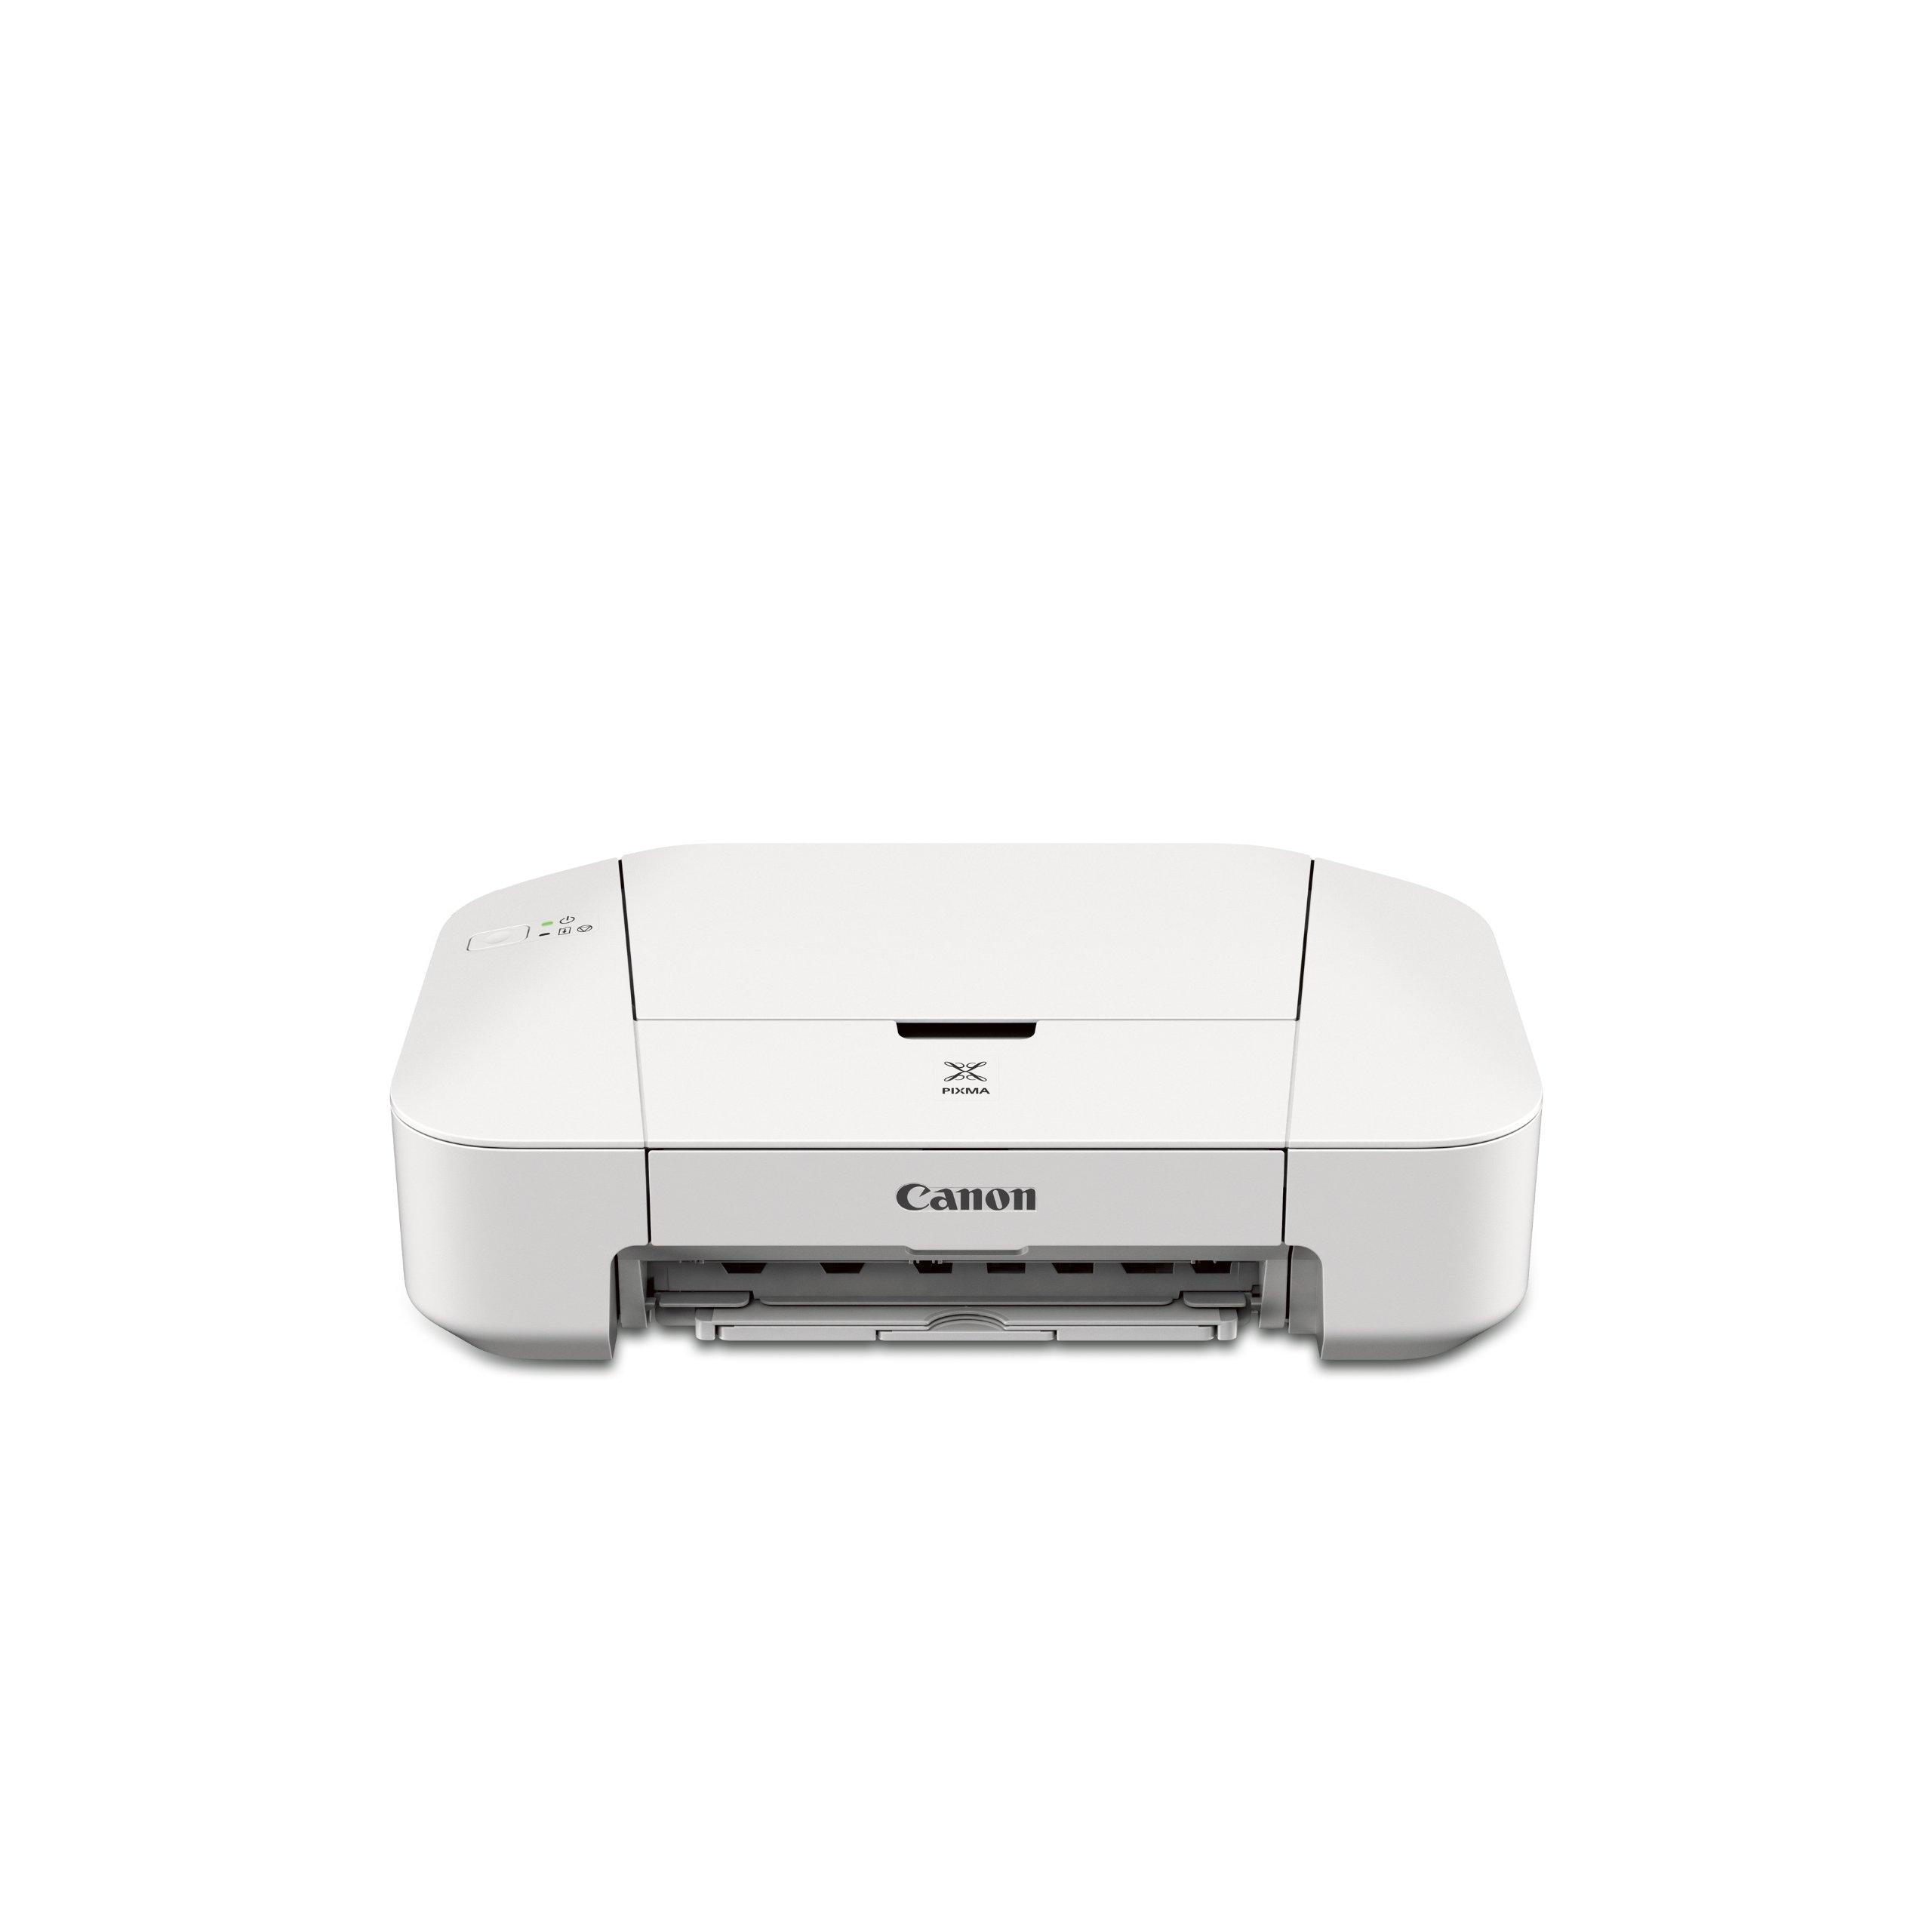 Canon IP2820 Inkjet Printer